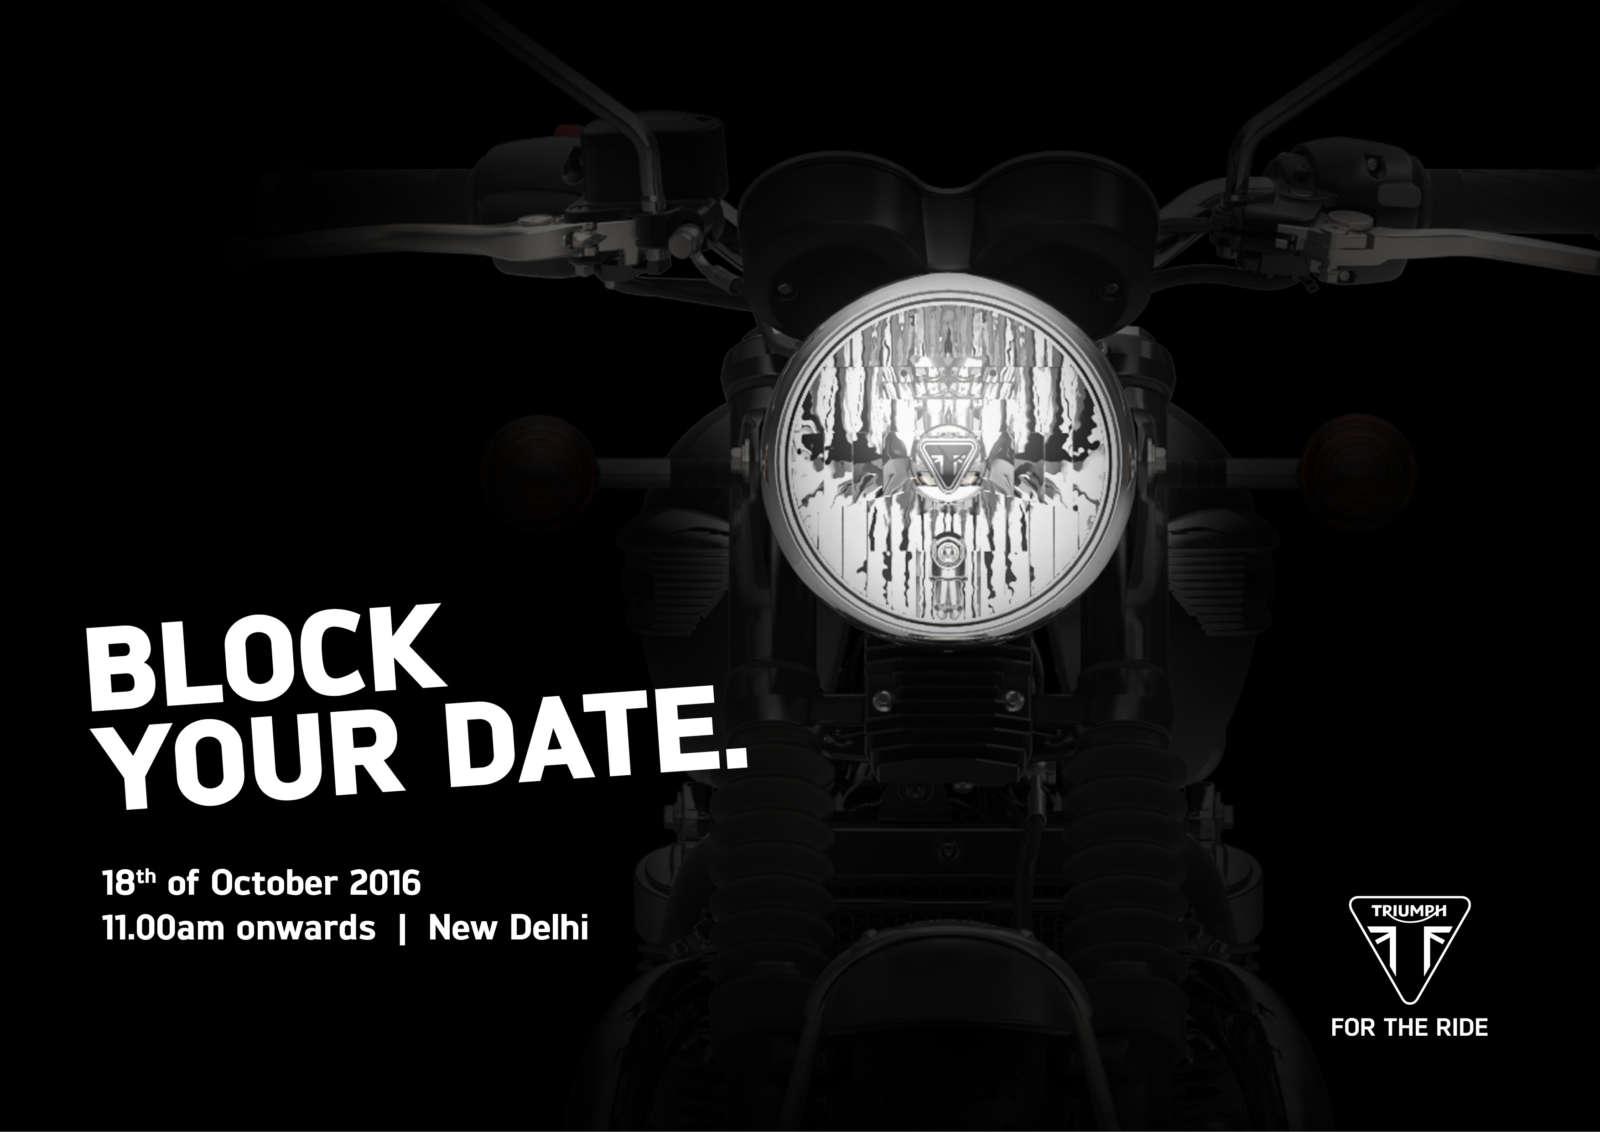 triumph-motorcycles-launch